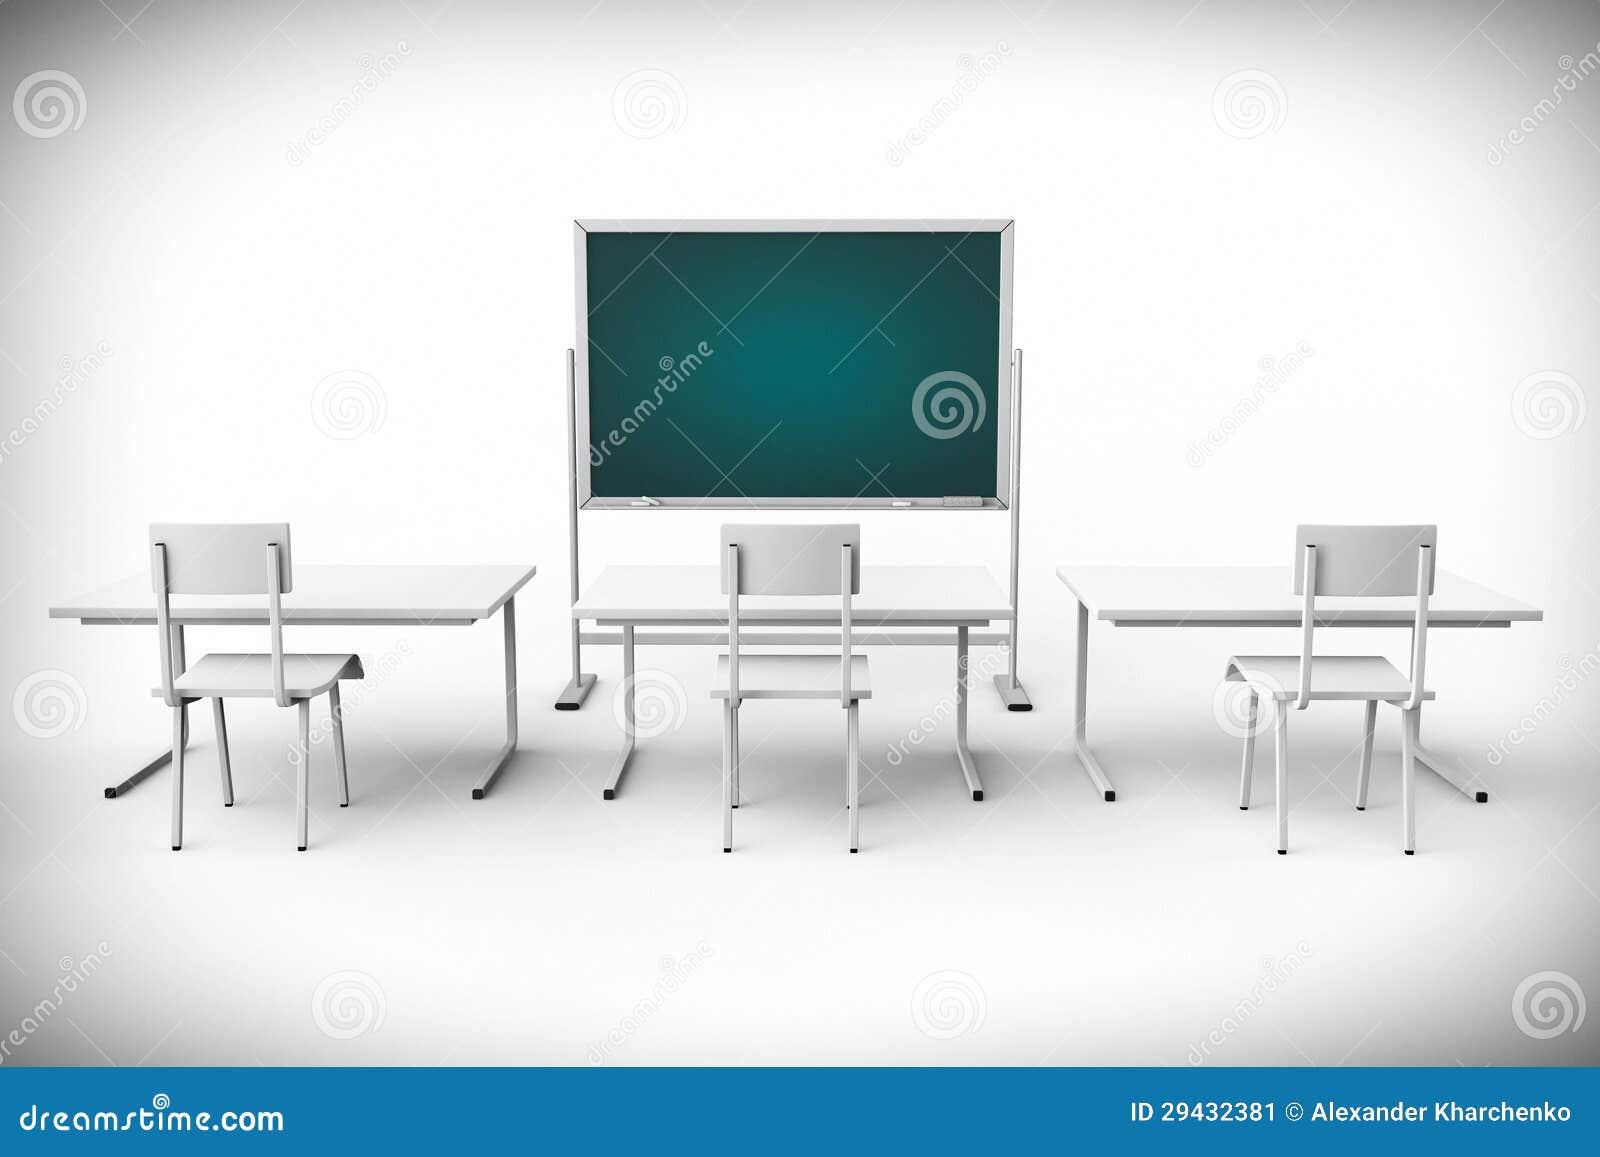 Classroom Blackboard Design ~ Empty classroom with blackboard and desk stock image